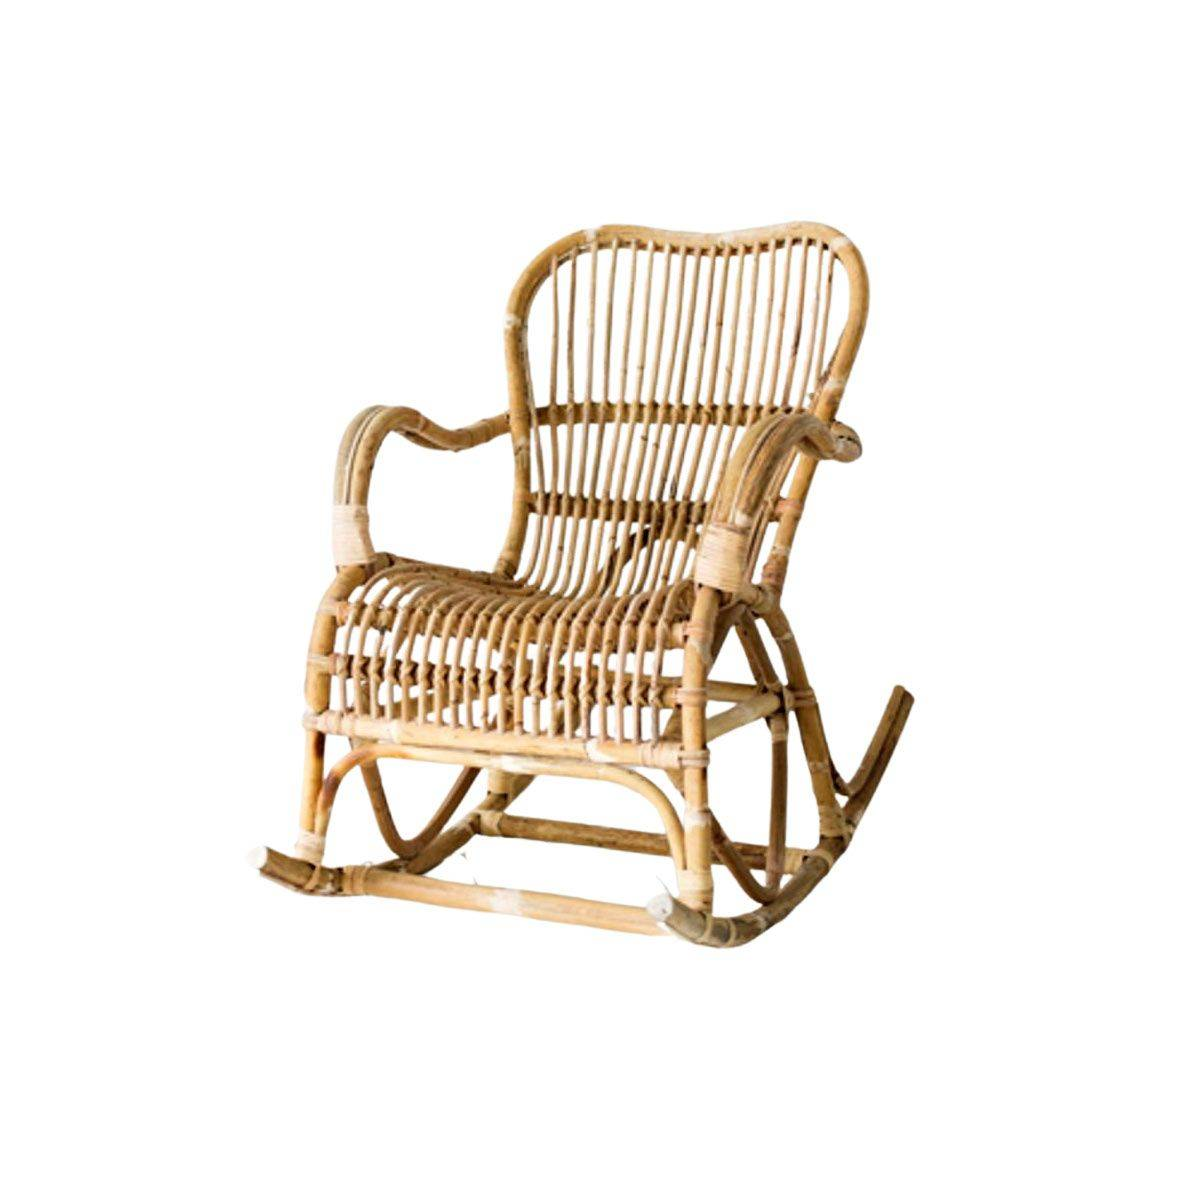 Casatera Rocking chair en rotin naturel  bois clair